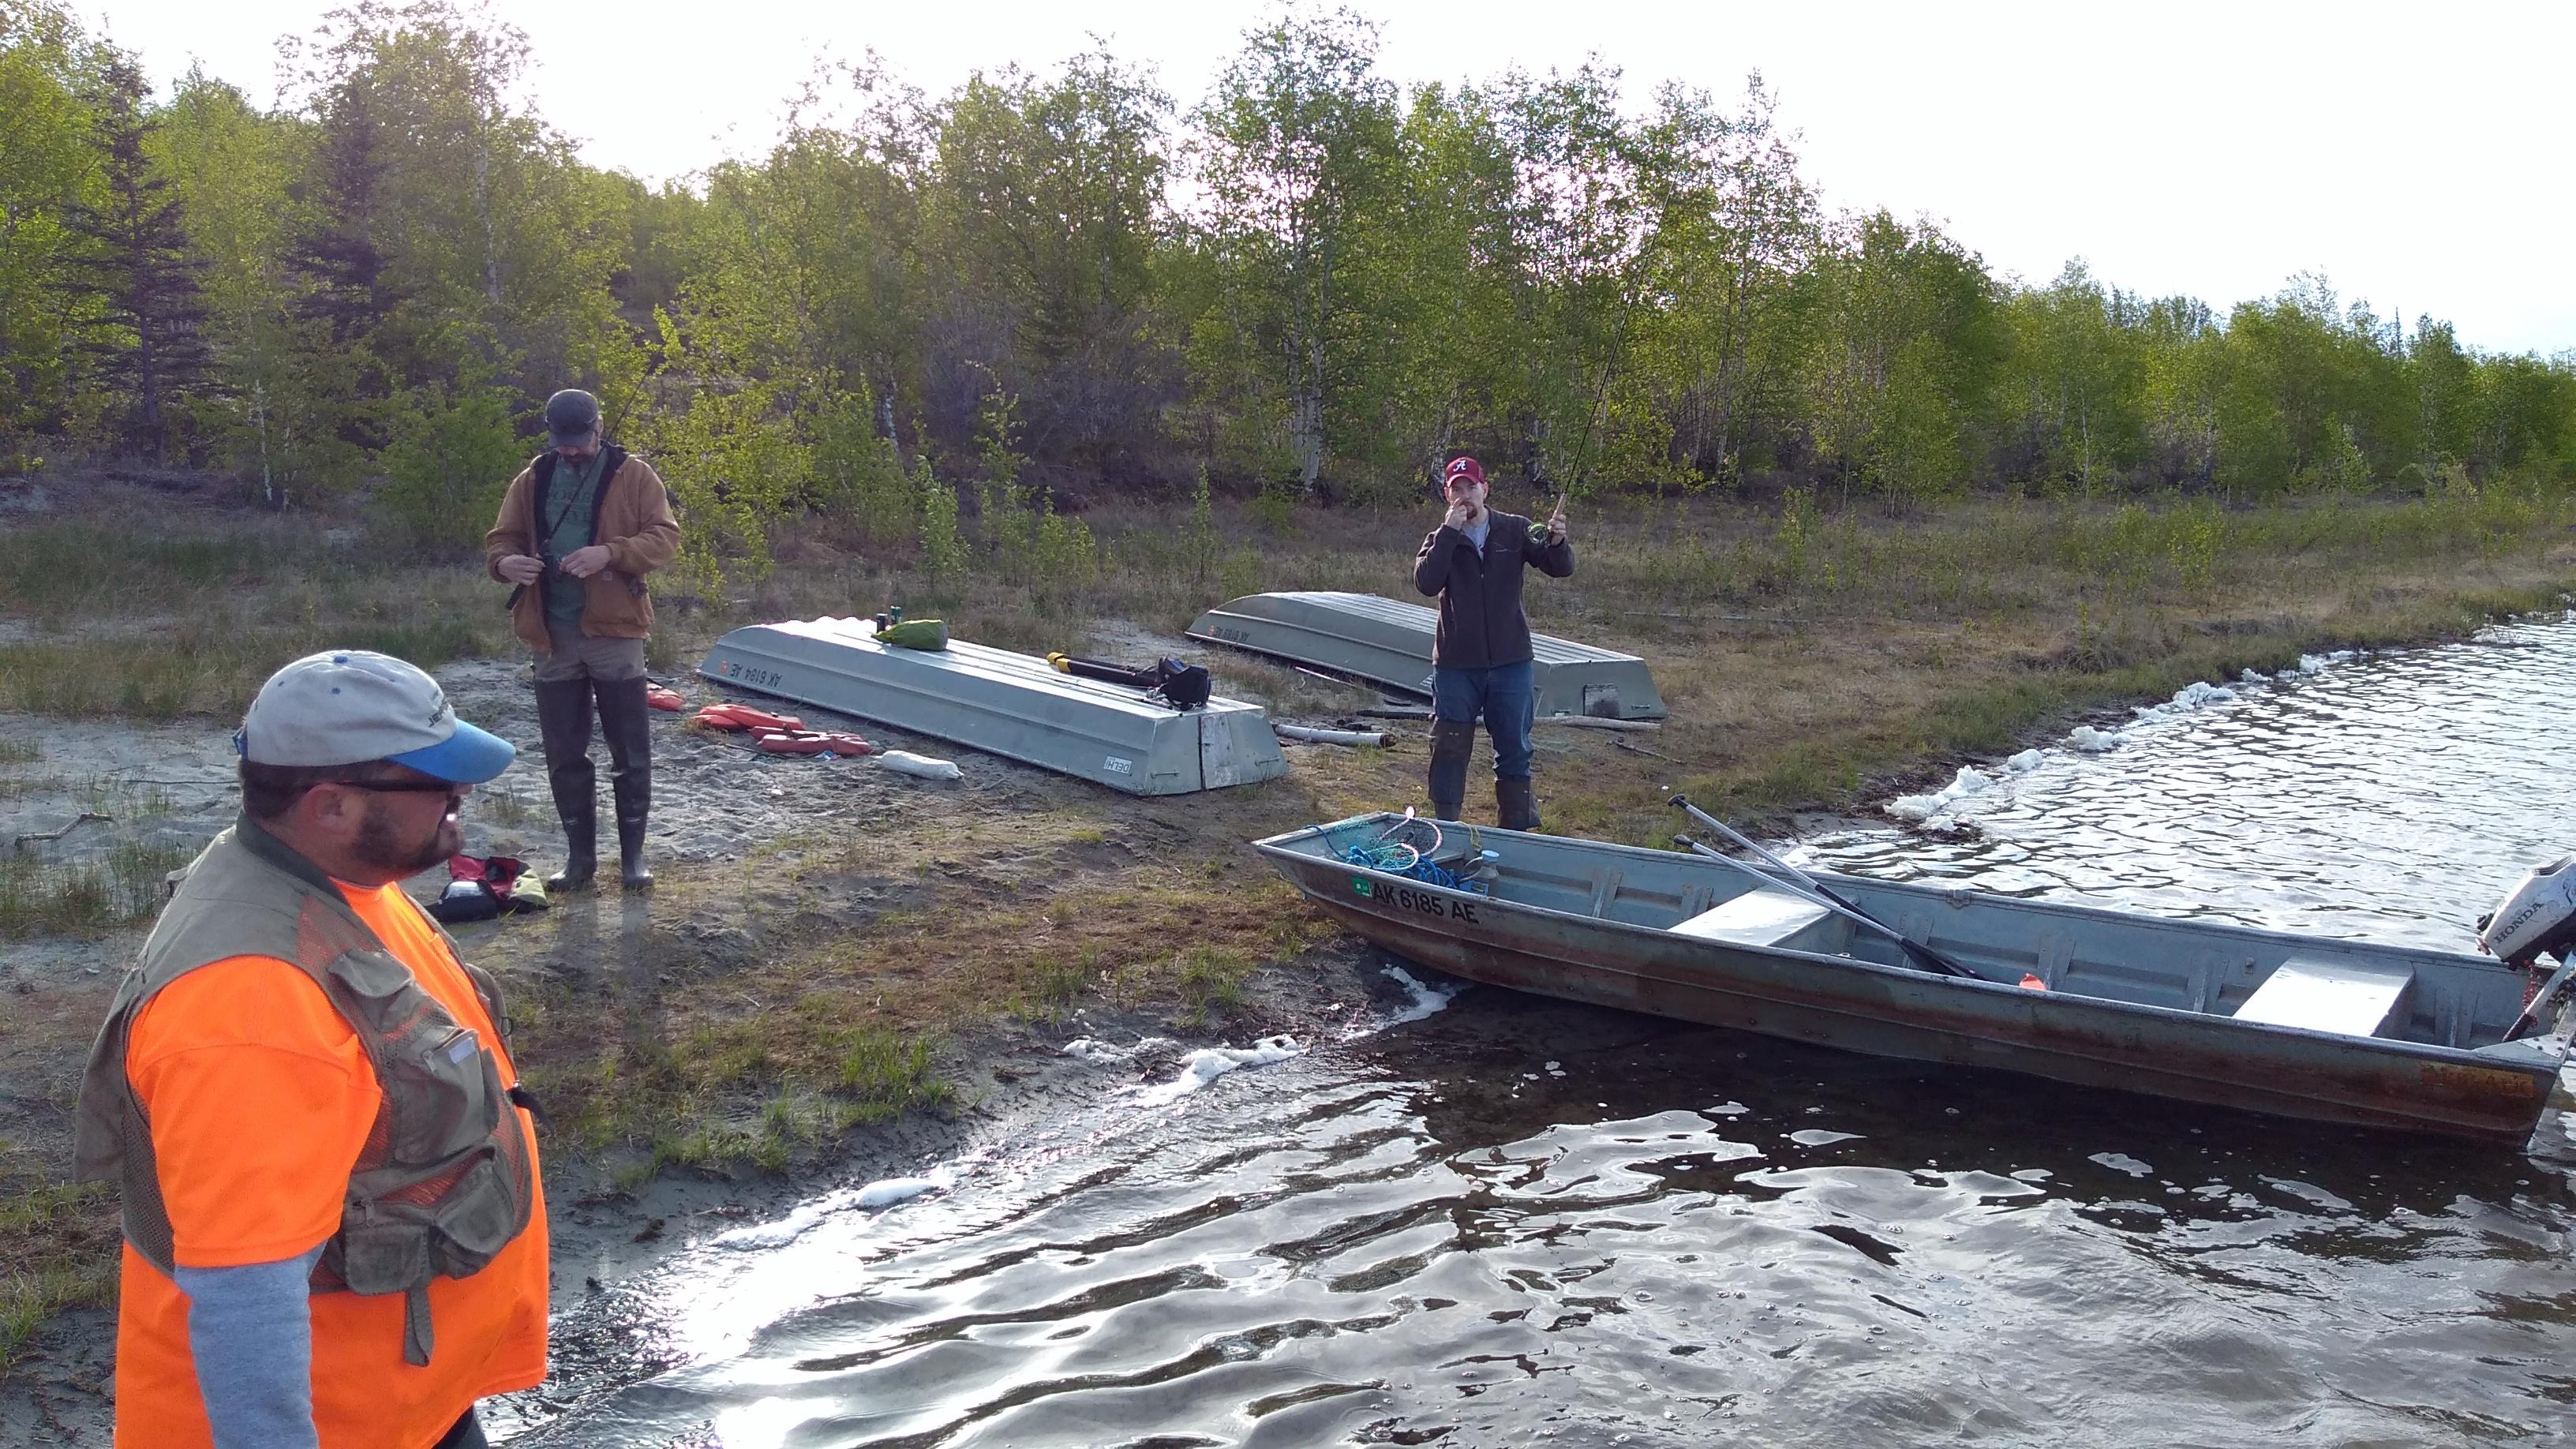 Preparing to fish at Dune Lake